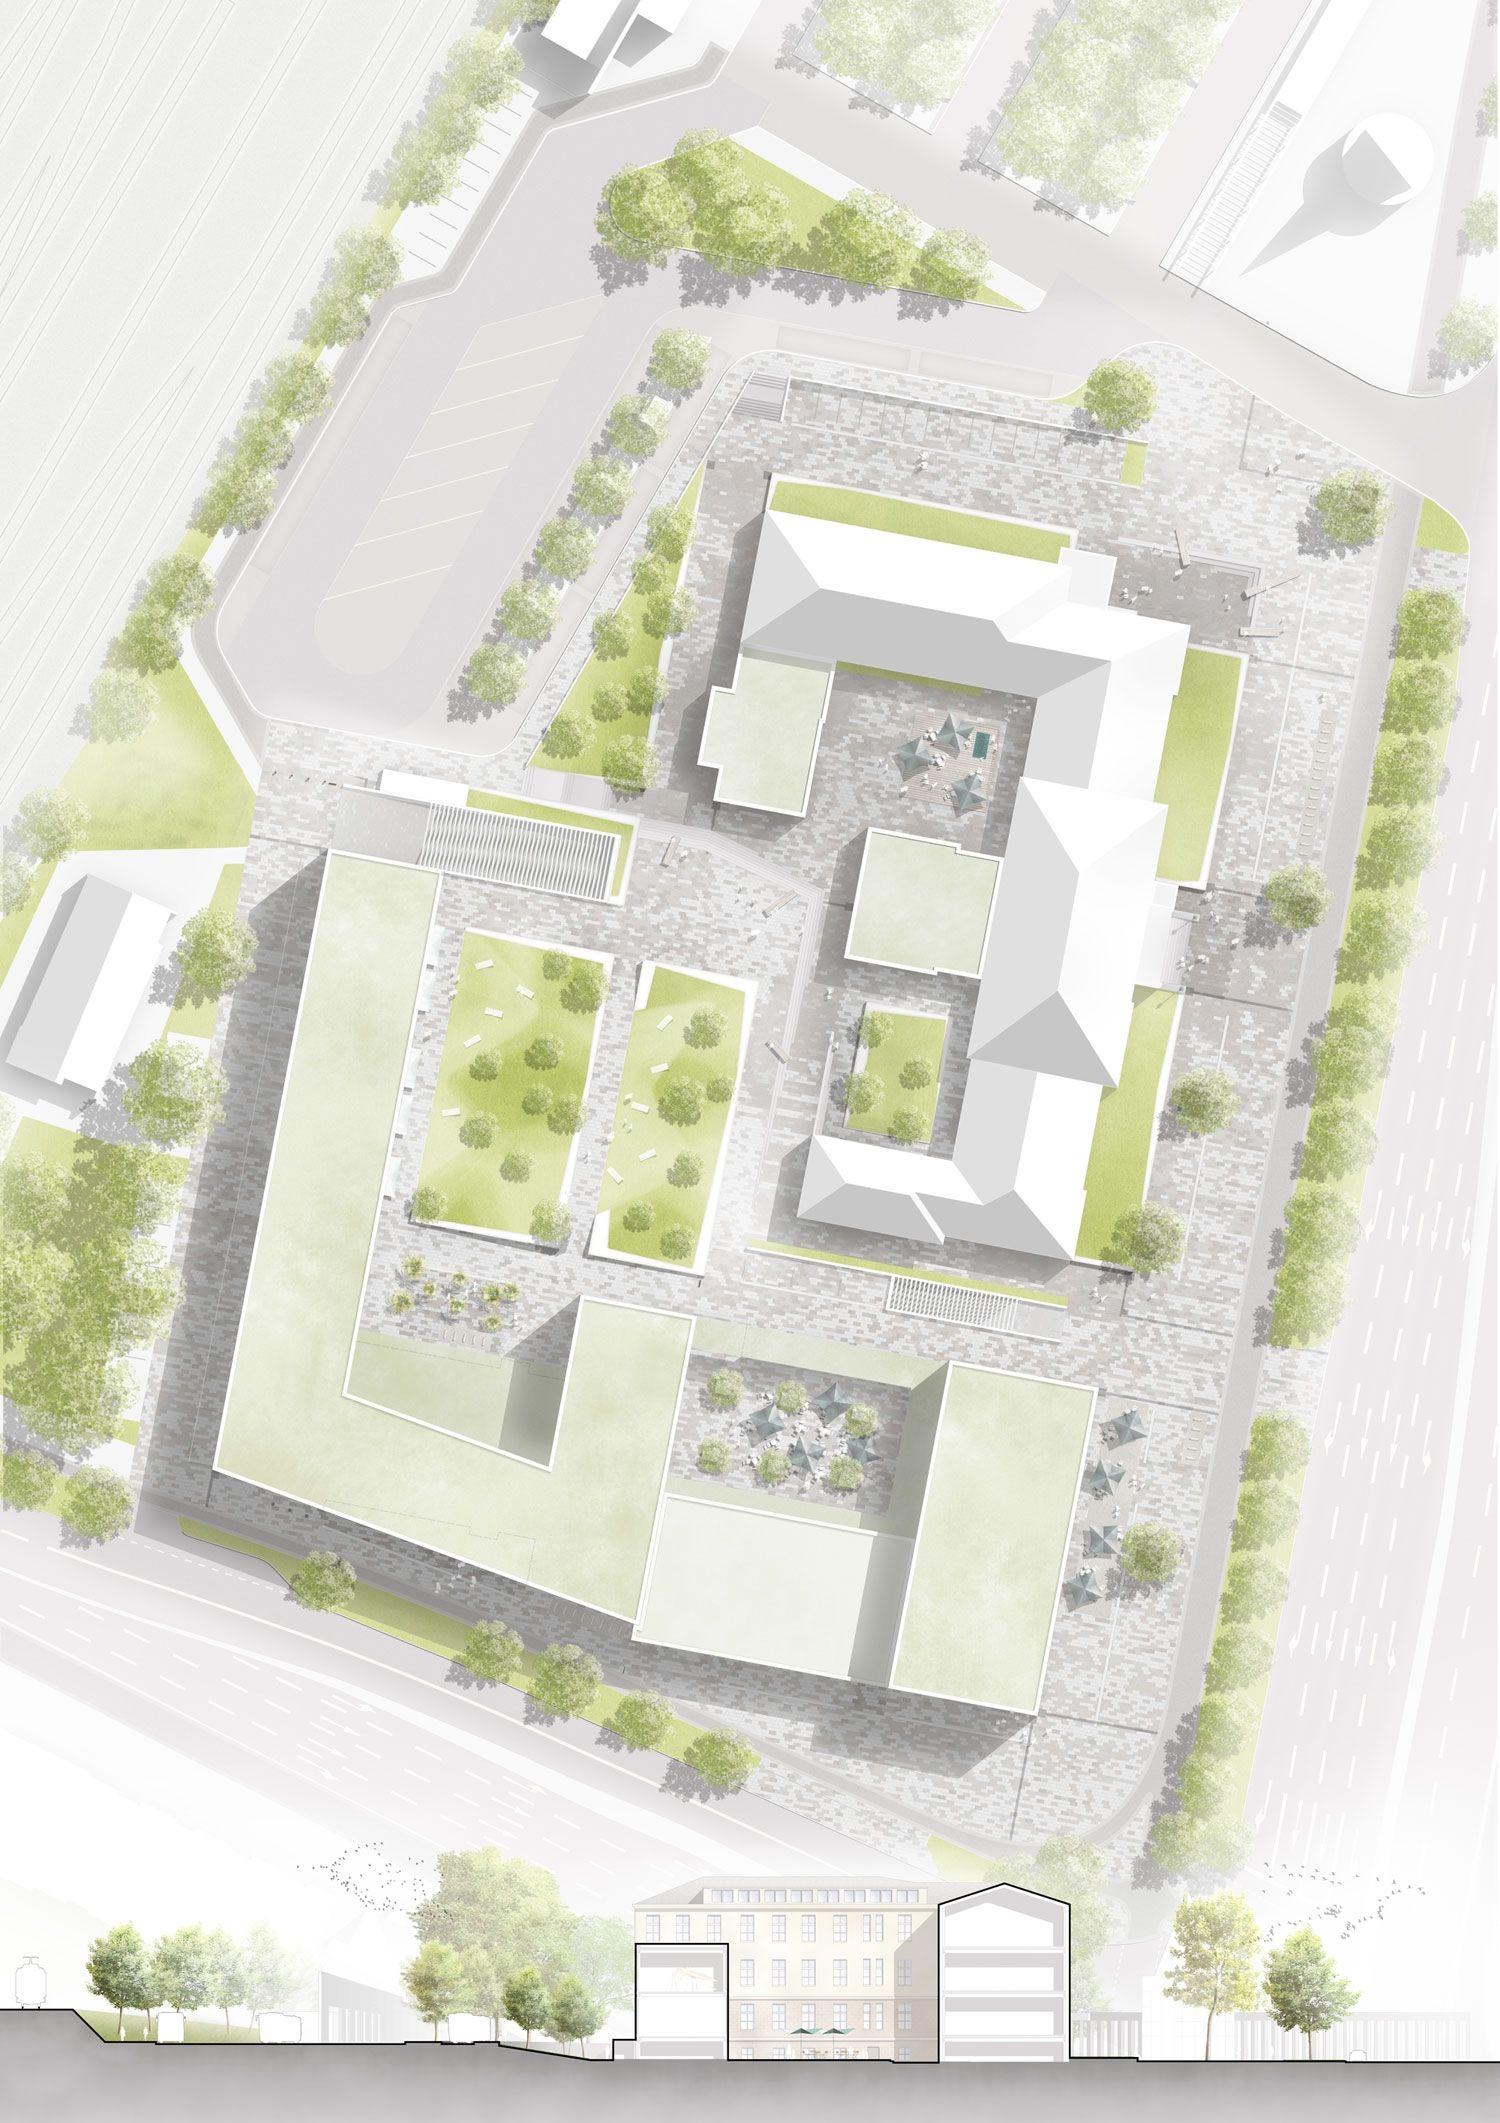 Ergebnis: Groner Tor...competitionline #urbanesdesign